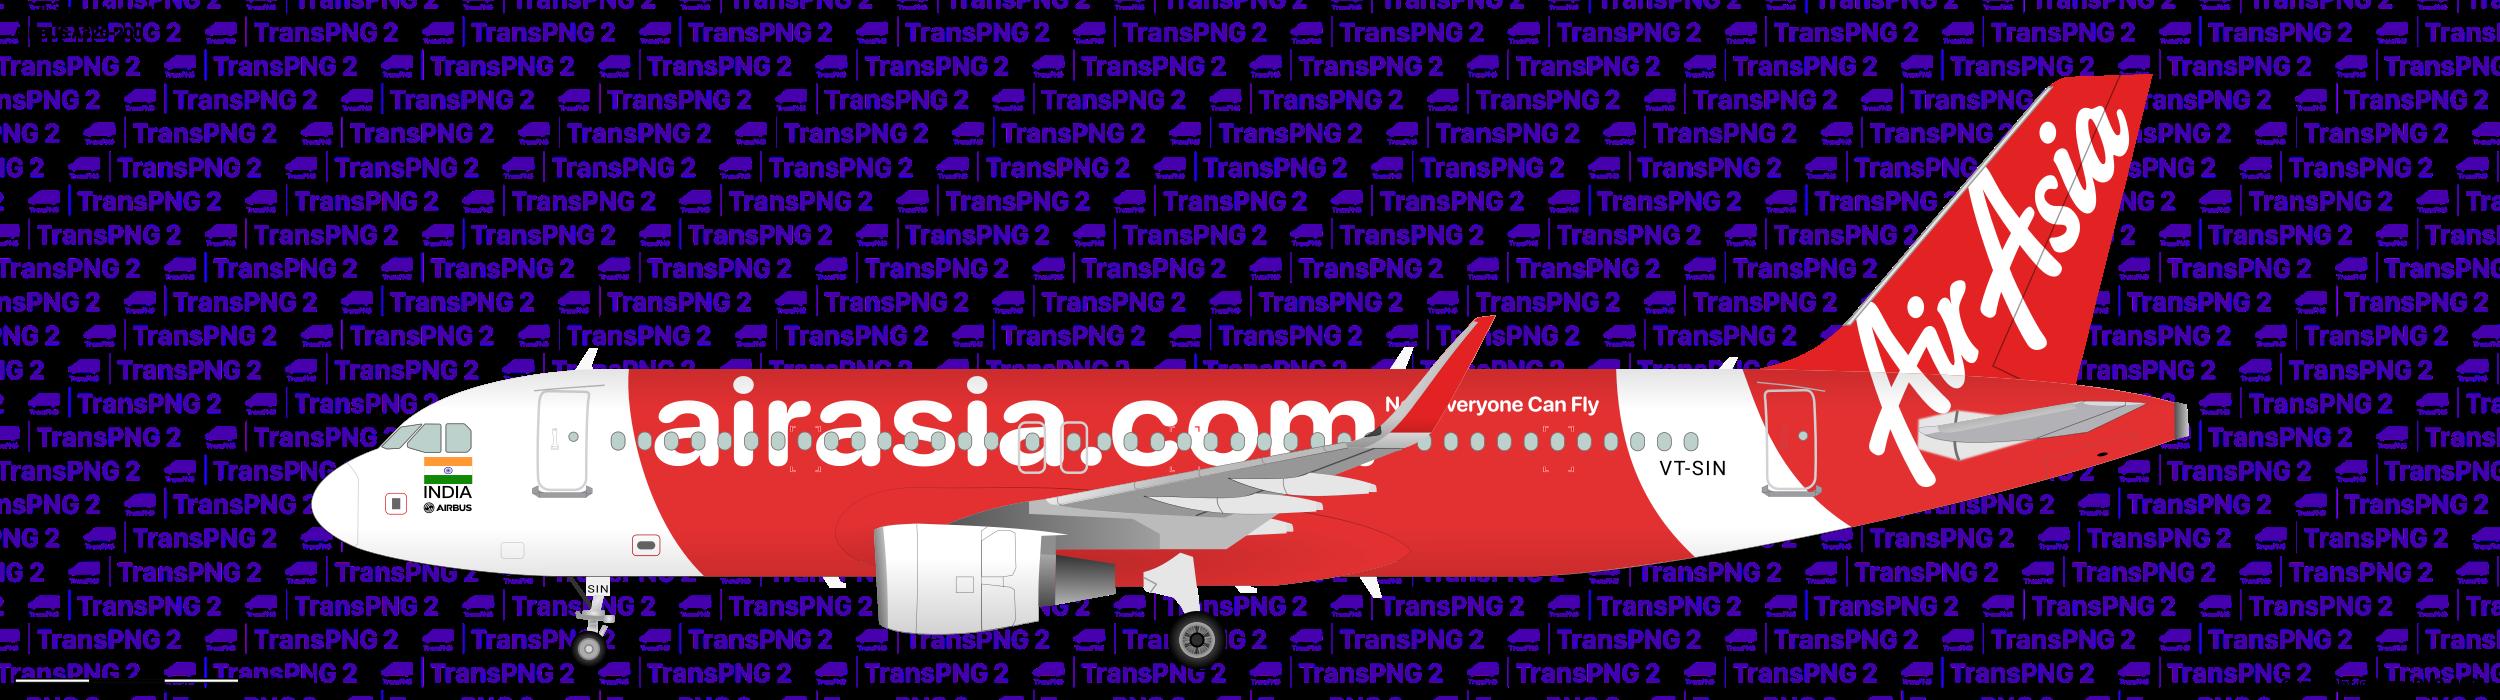 Airplane 25126